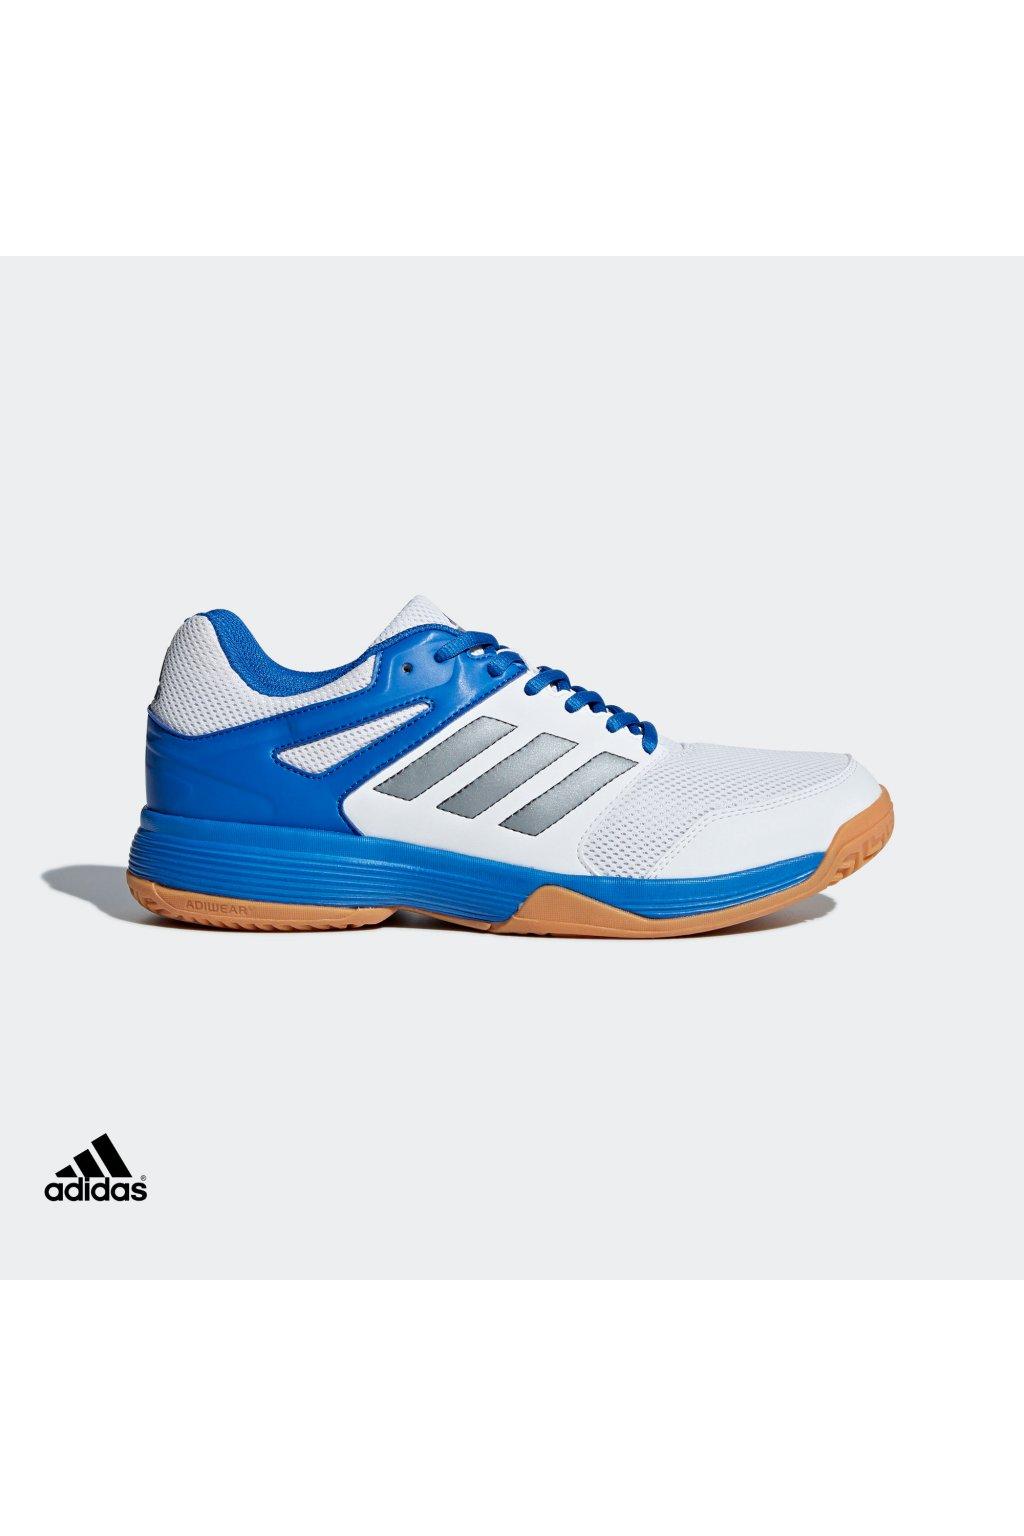 cm7888 adidas speedcourt (1)